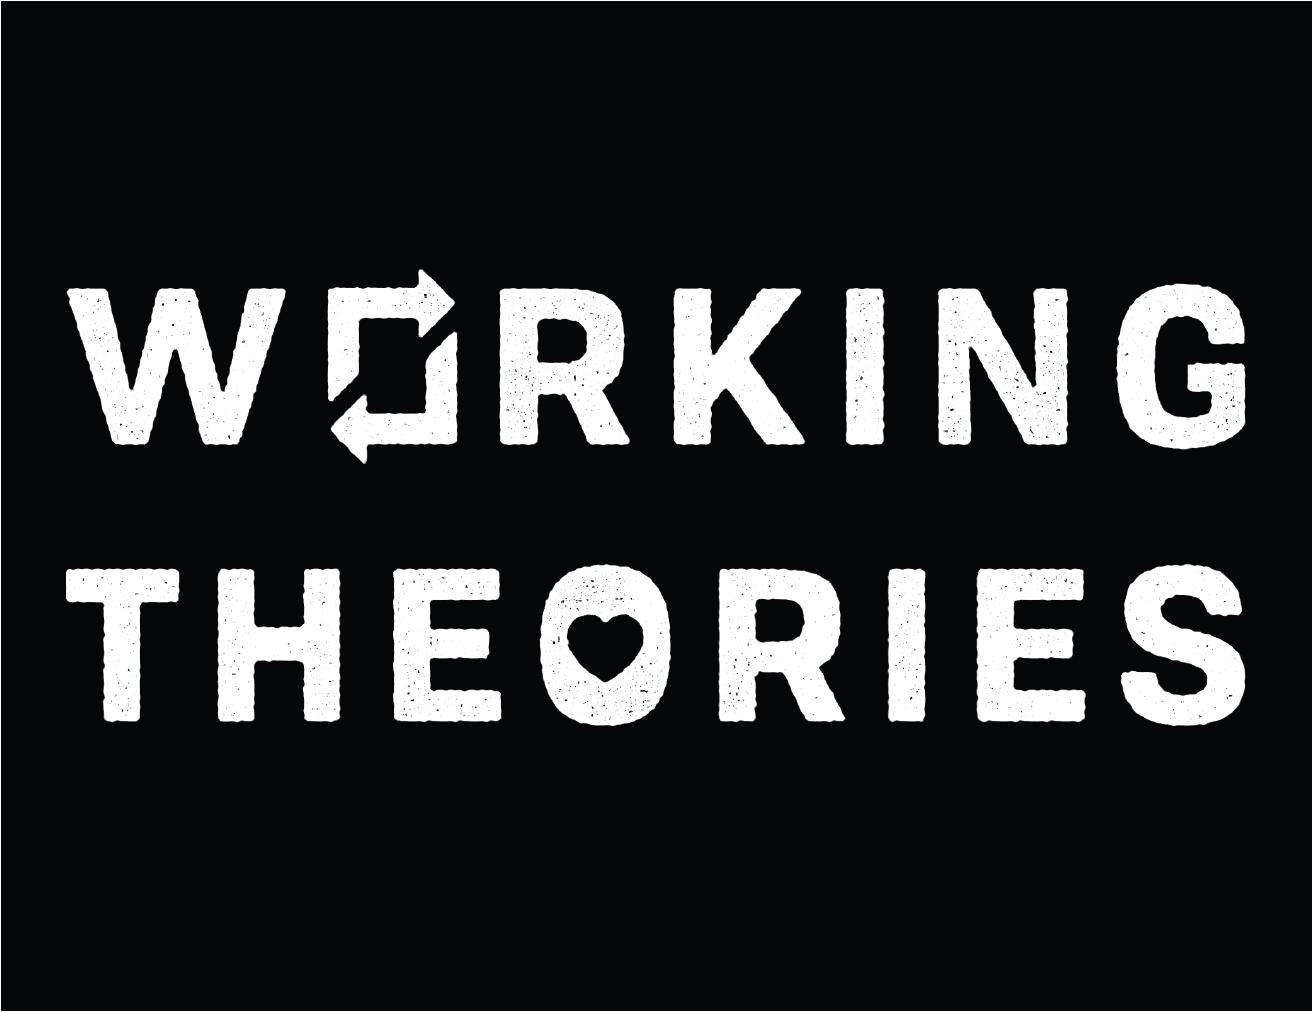 L-BiggarWorking Theories-01.png